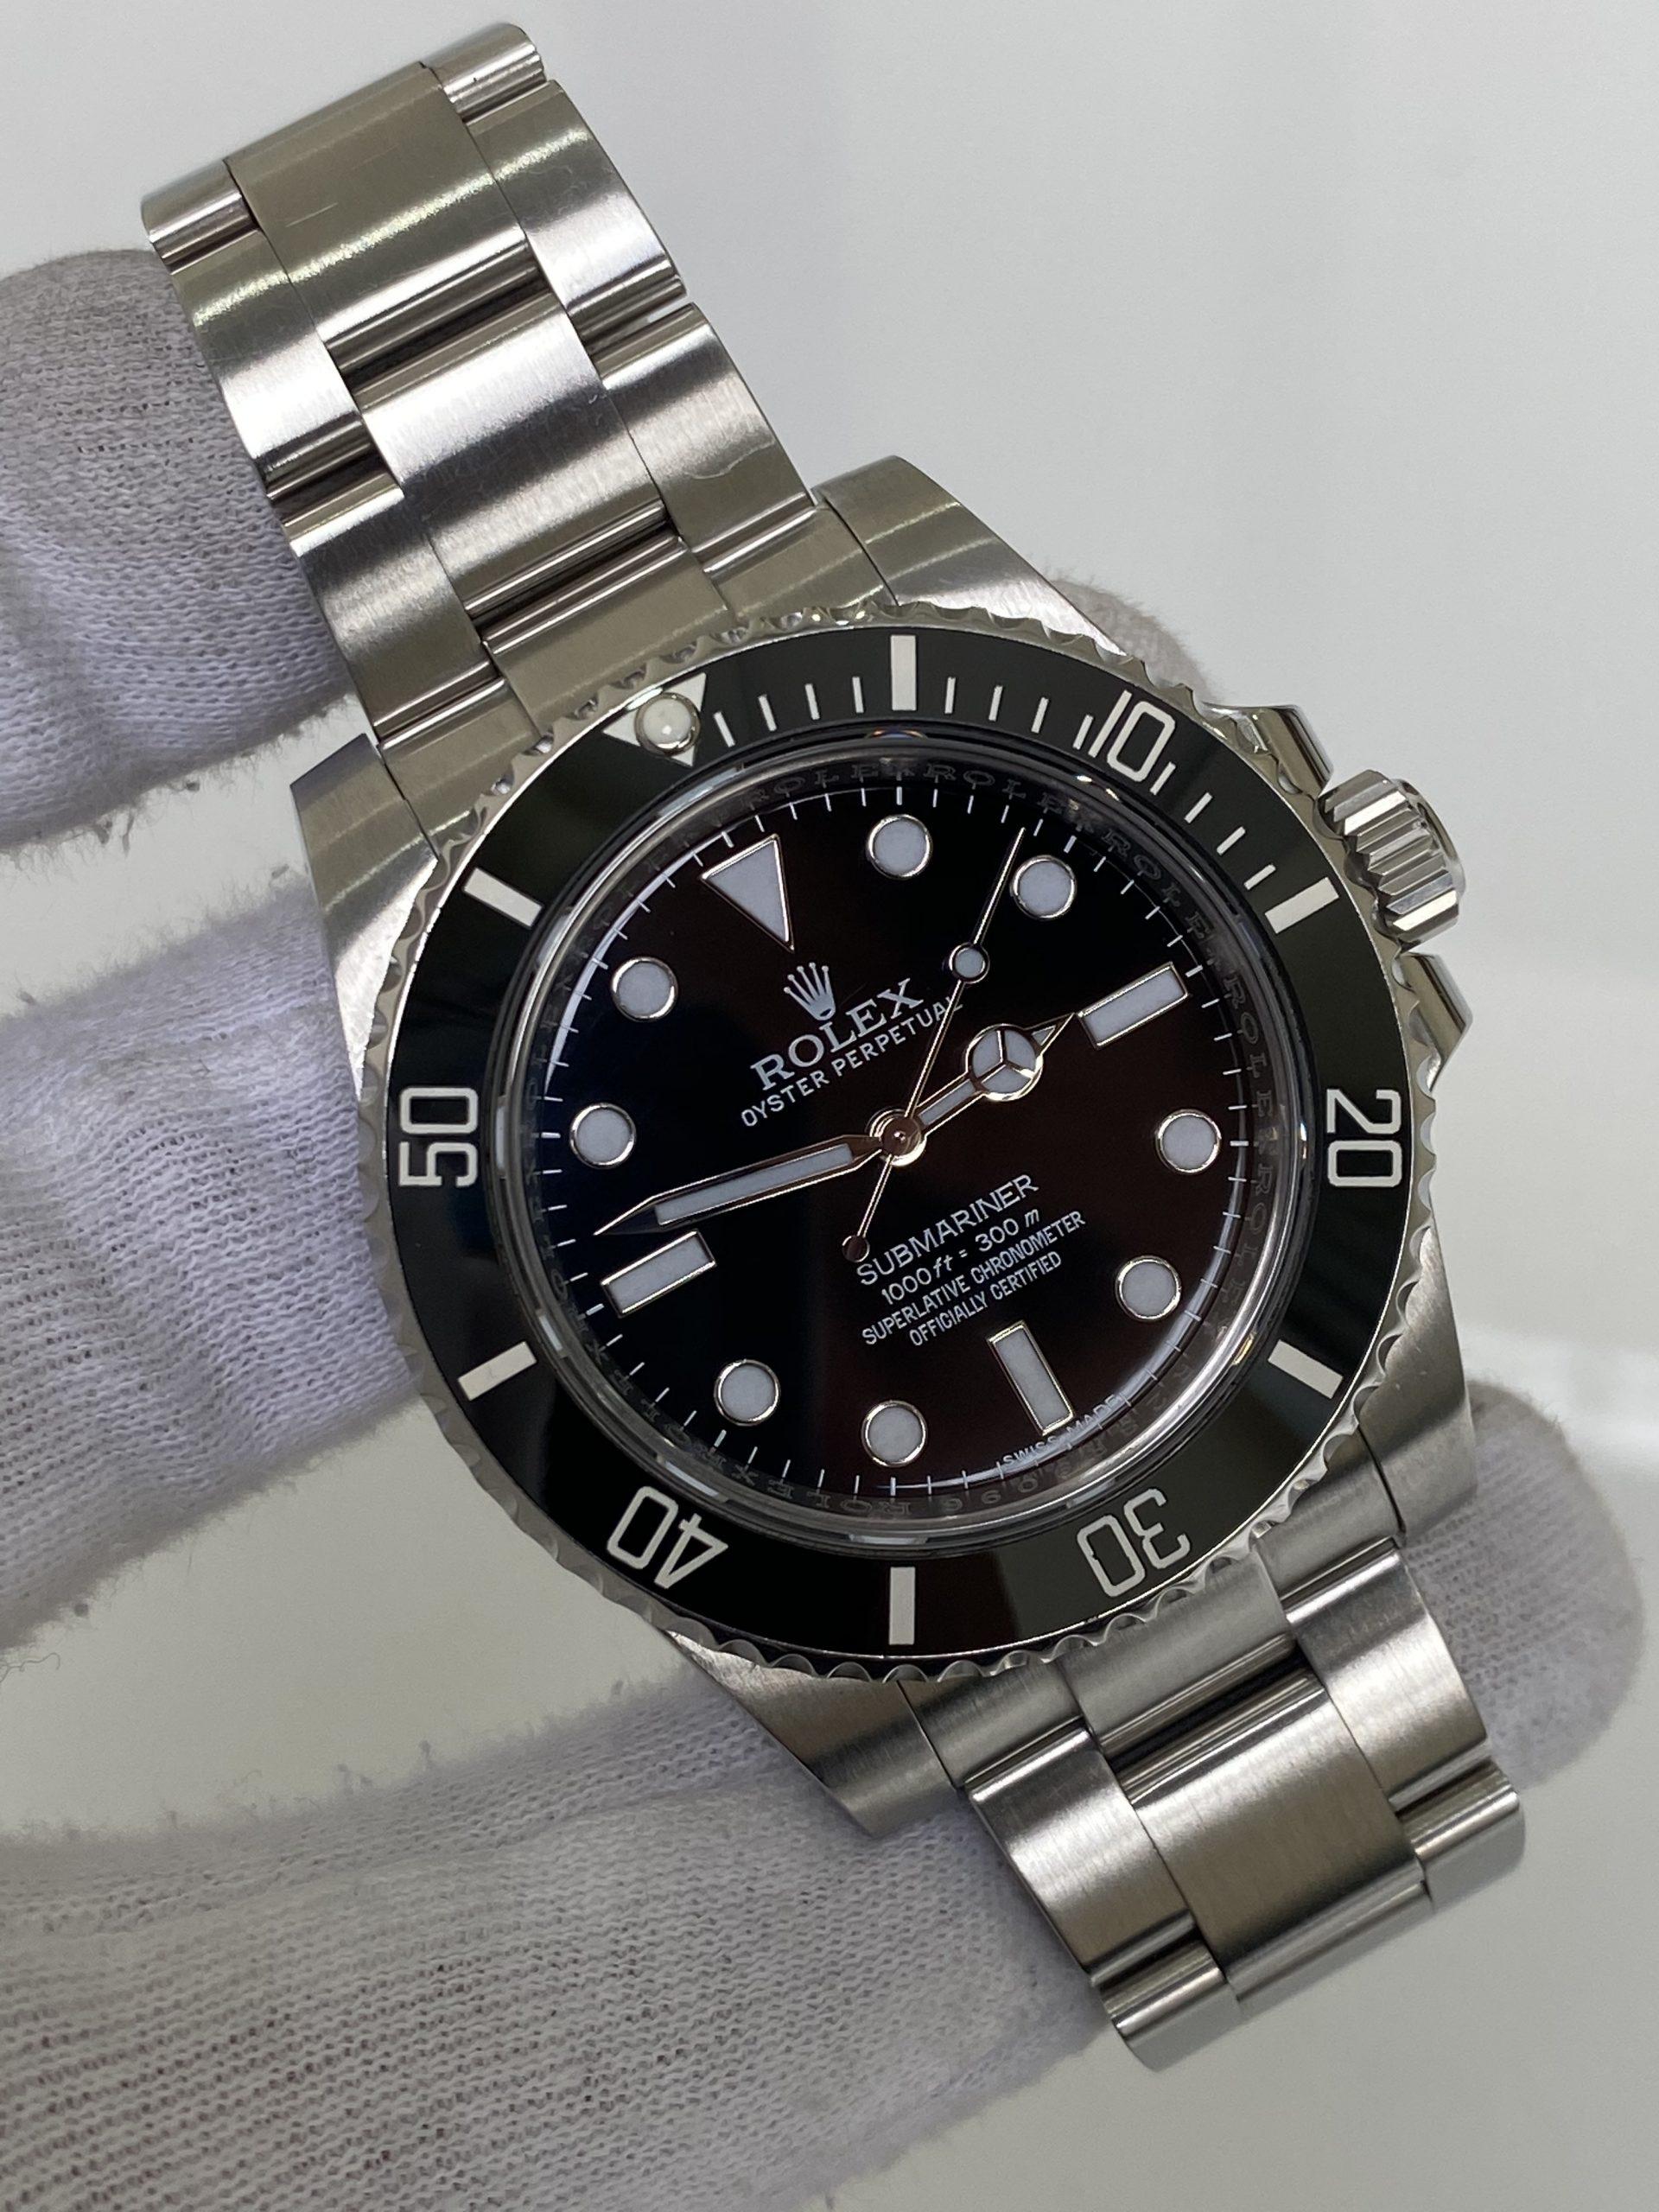 Đồng hồ Rolex Submariner 114060